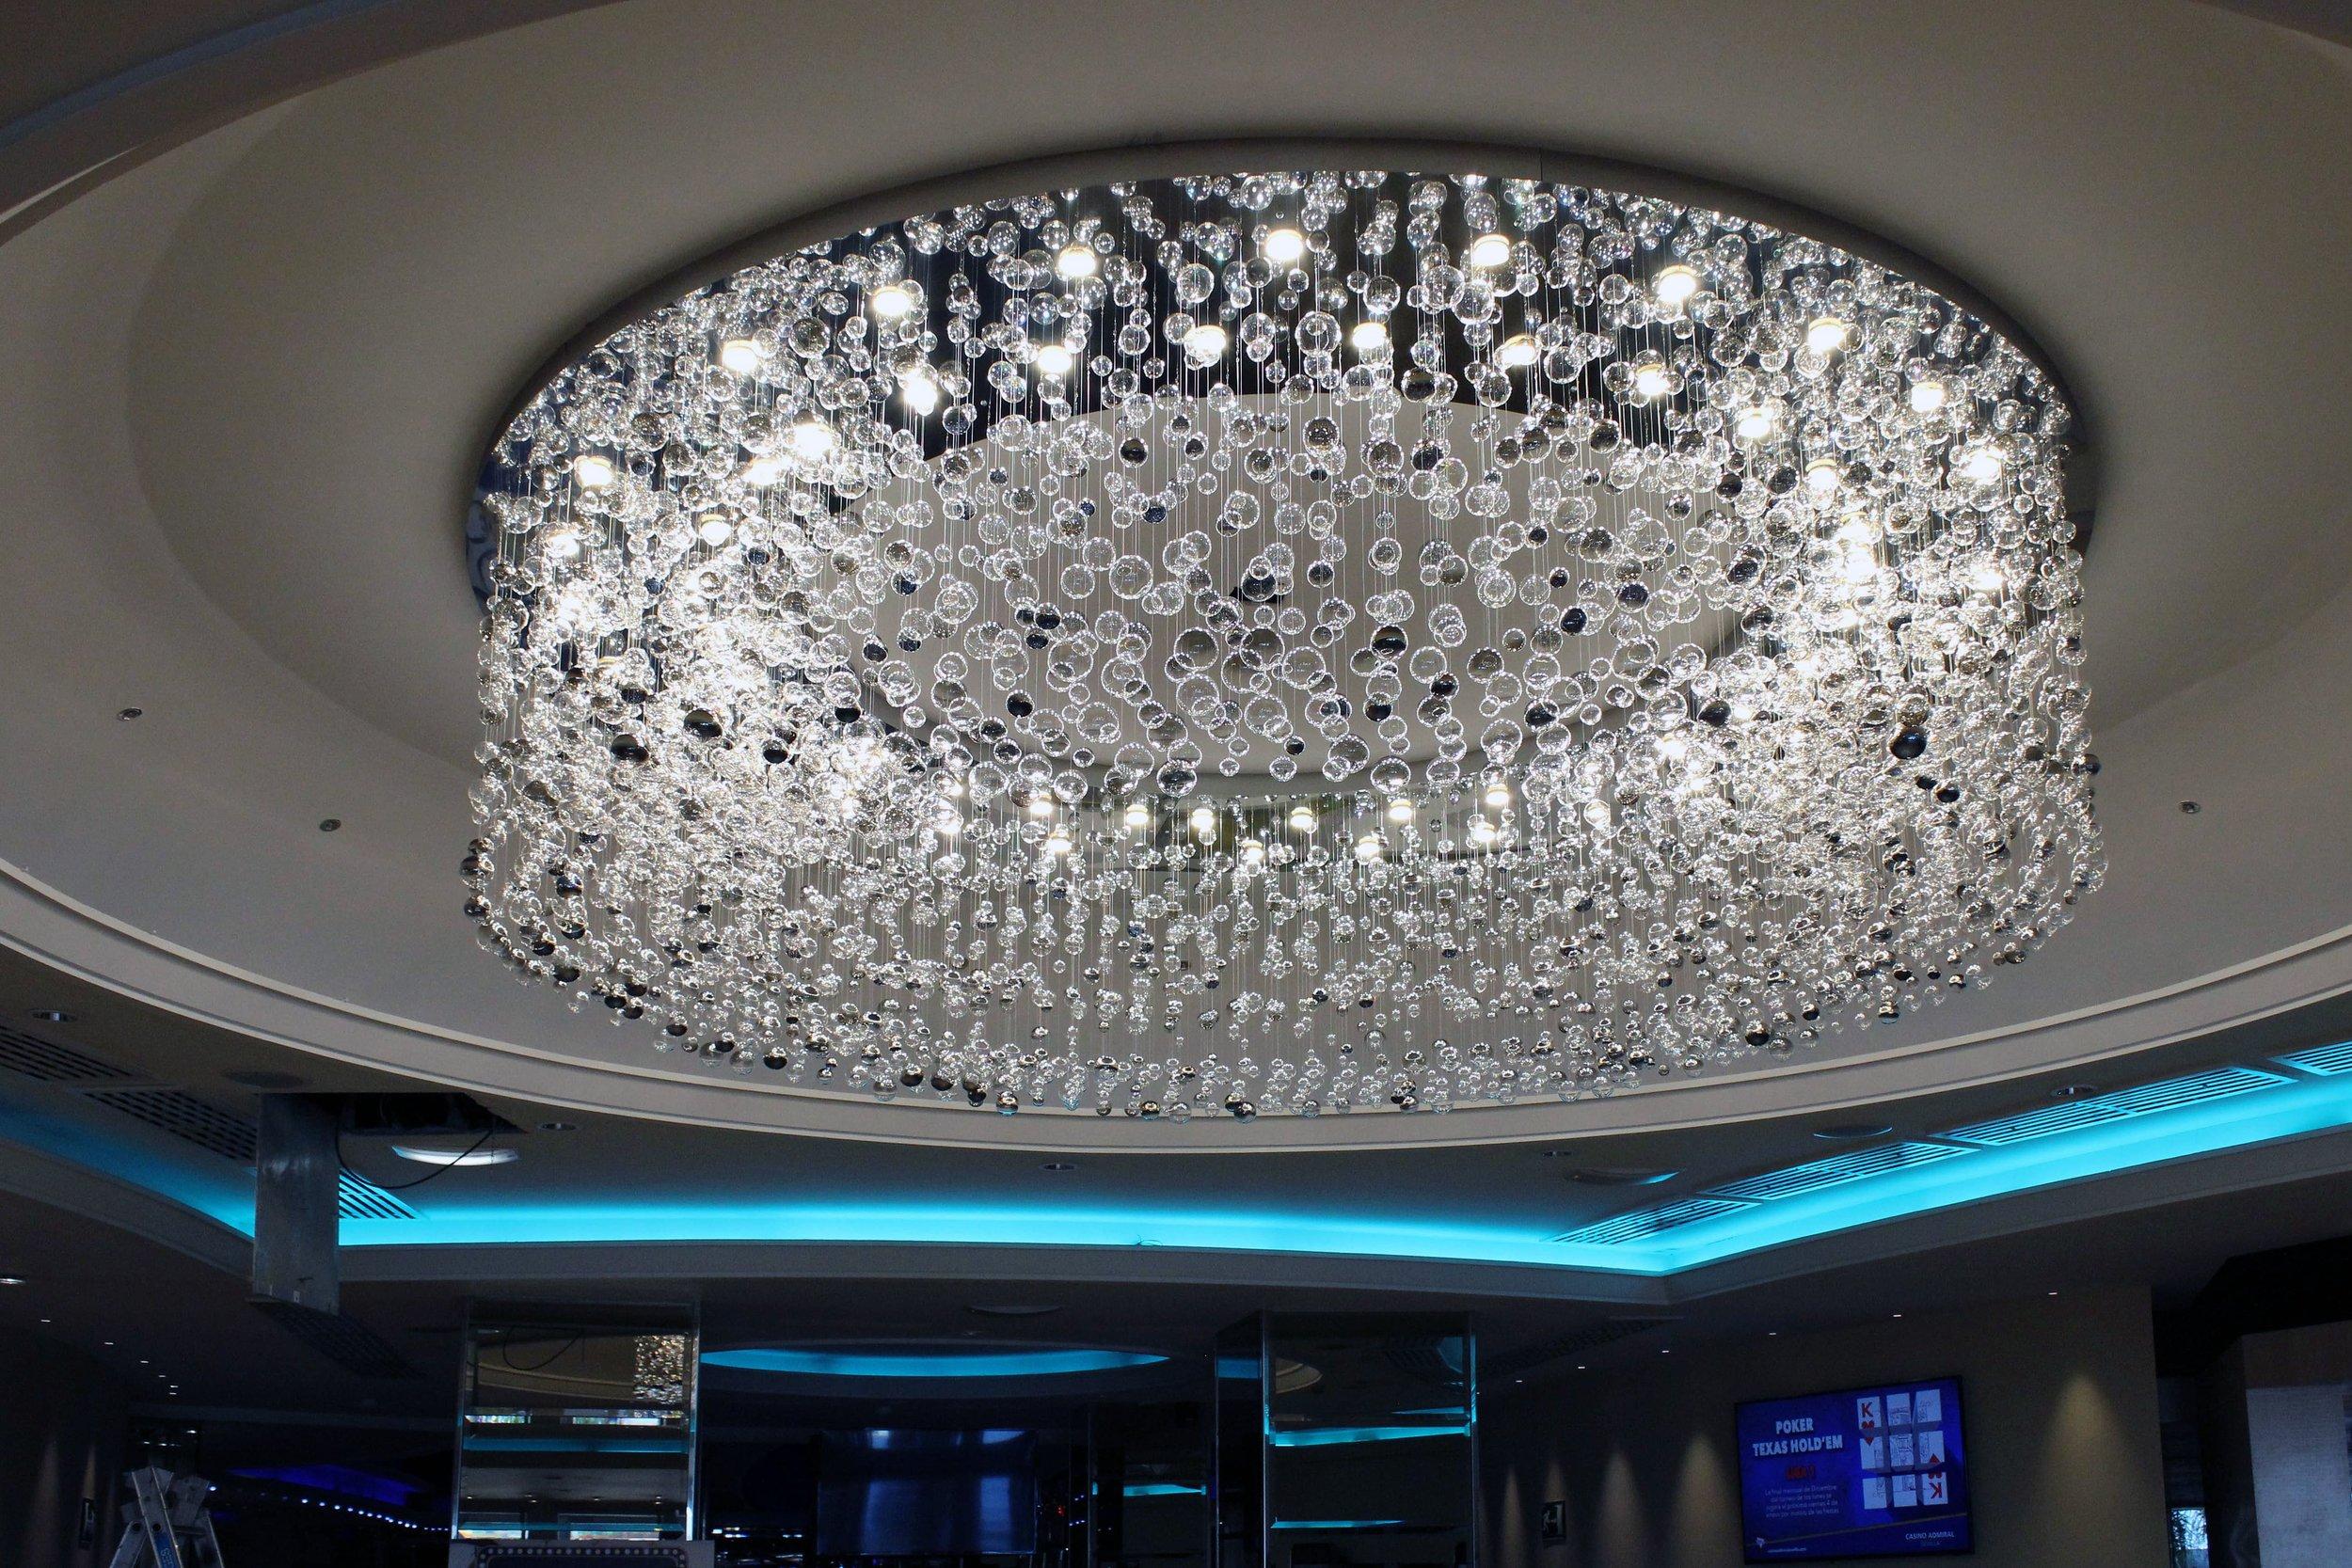 casino-spain-wranovsky-crystal-chandeliers-5.jpg